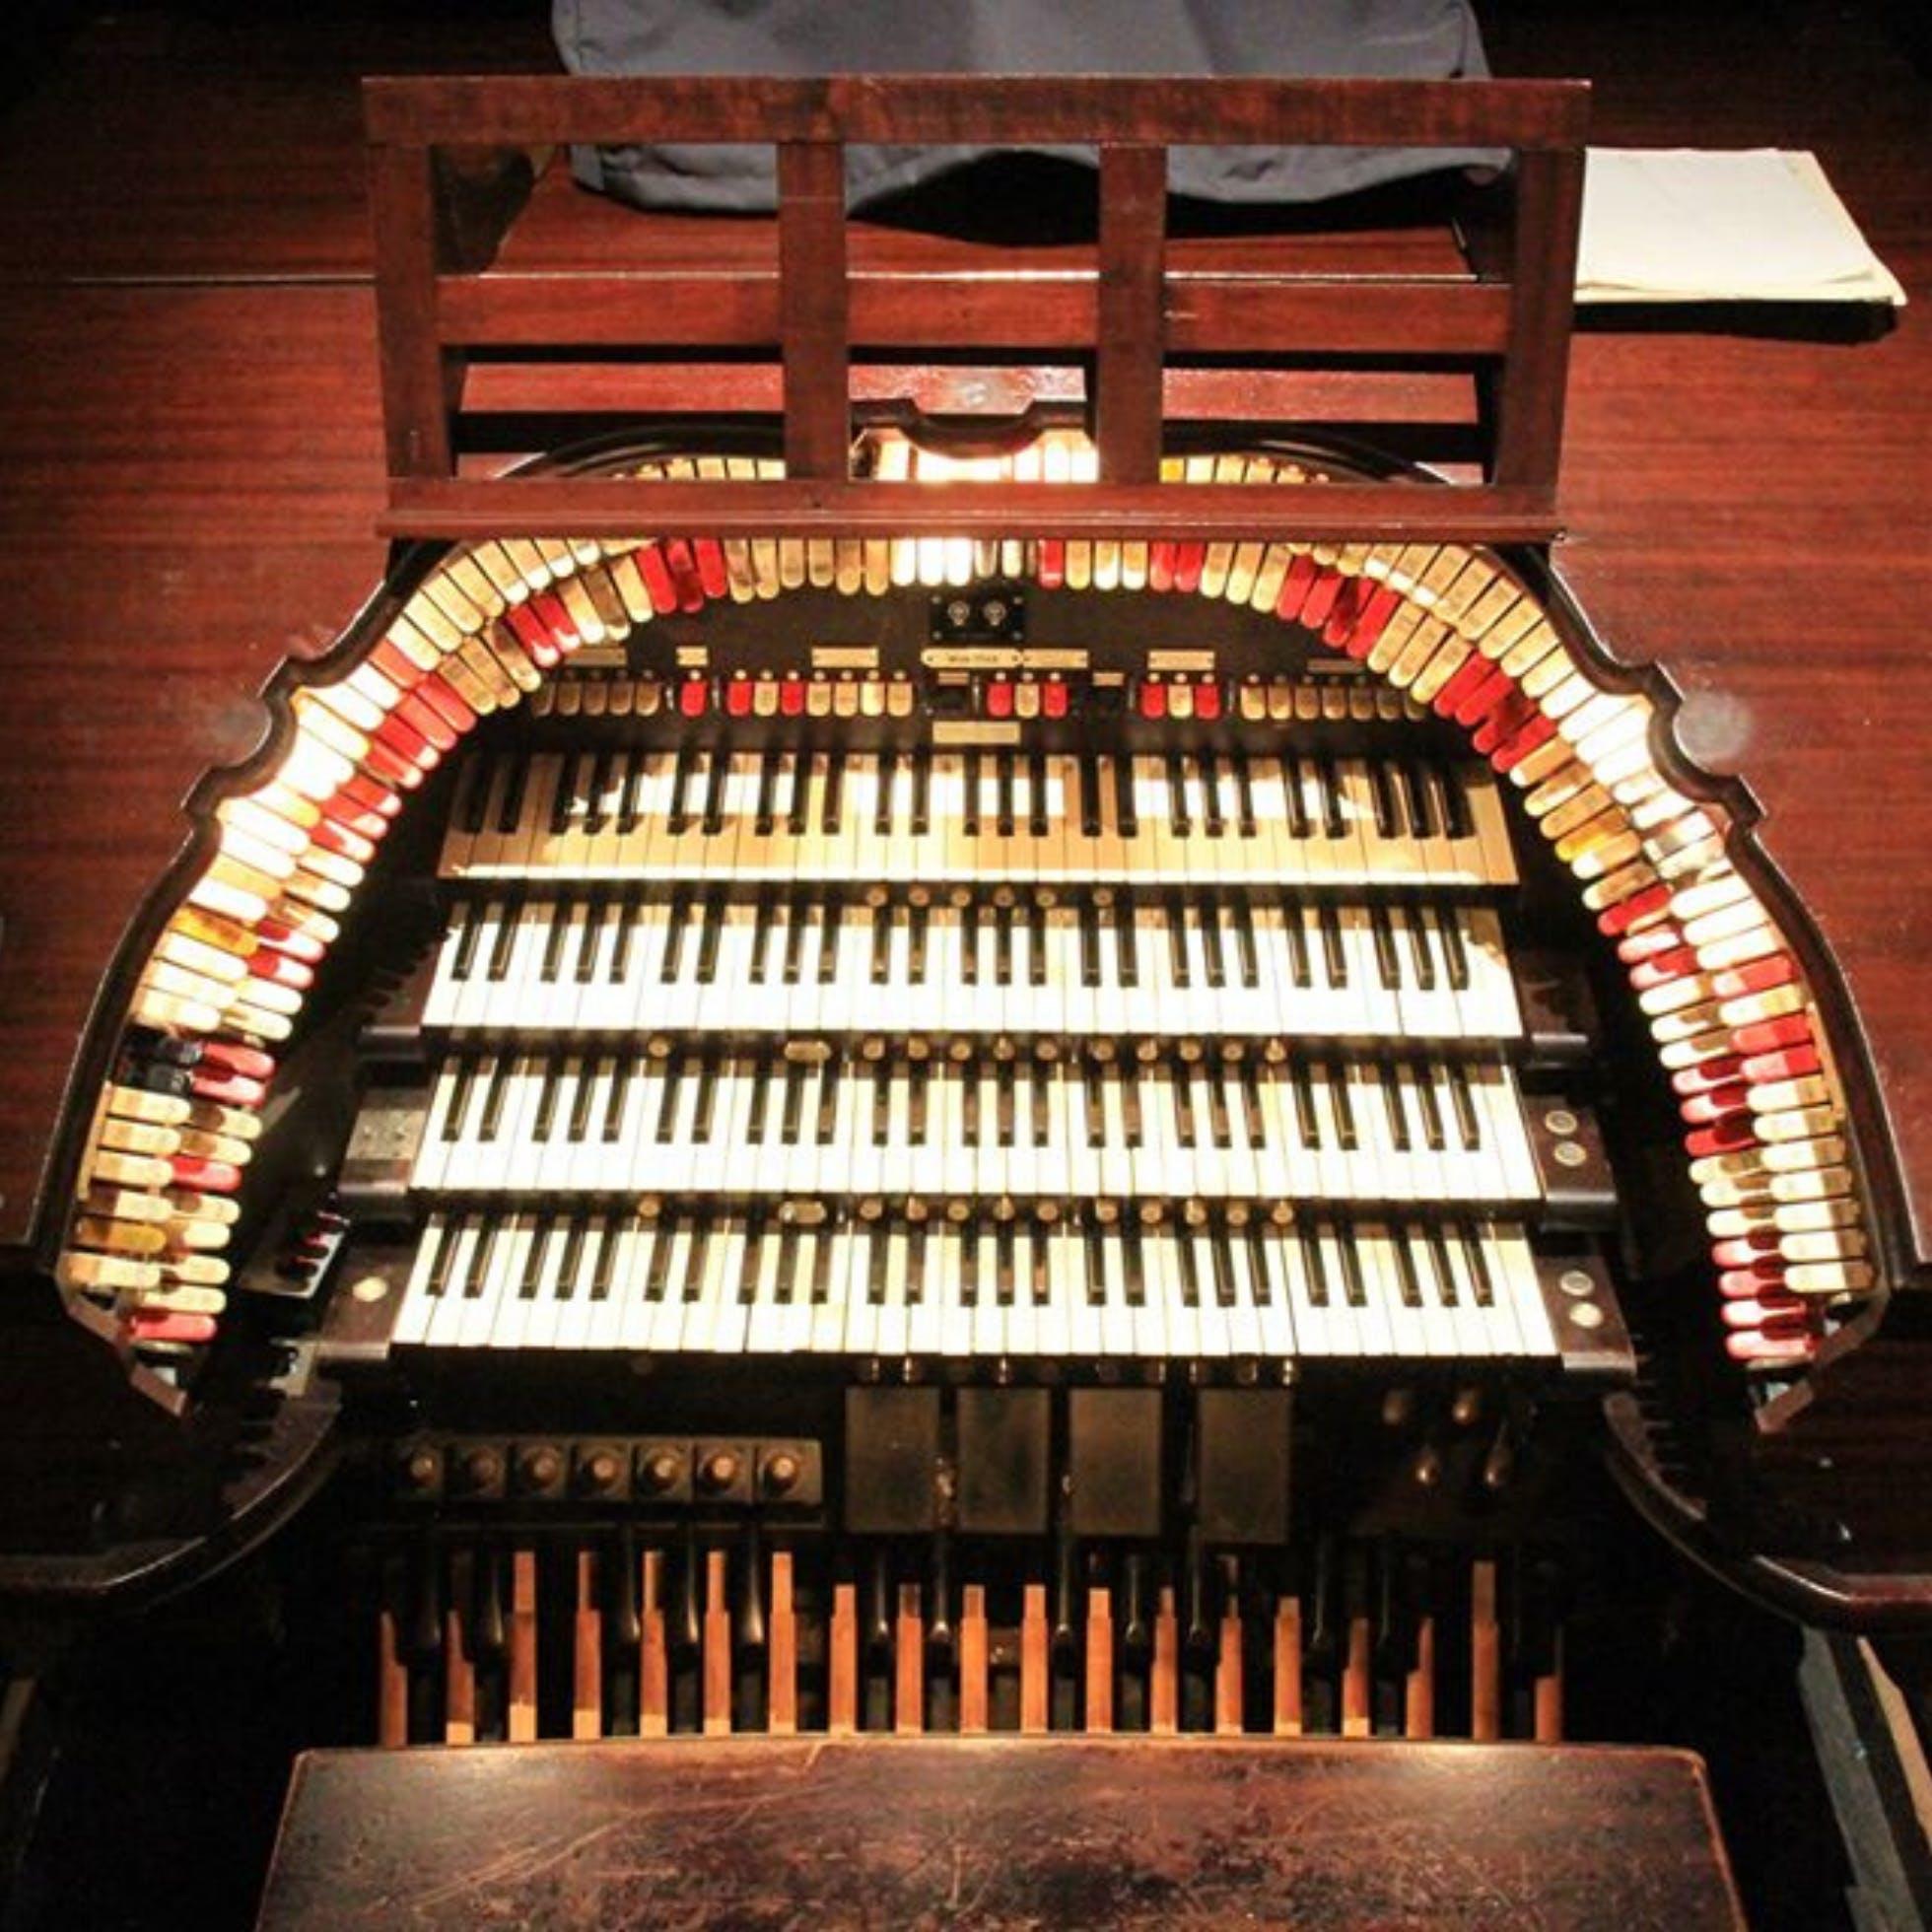 Facebook Live Virtual Tour: The Mighty Wurlitzer Organ